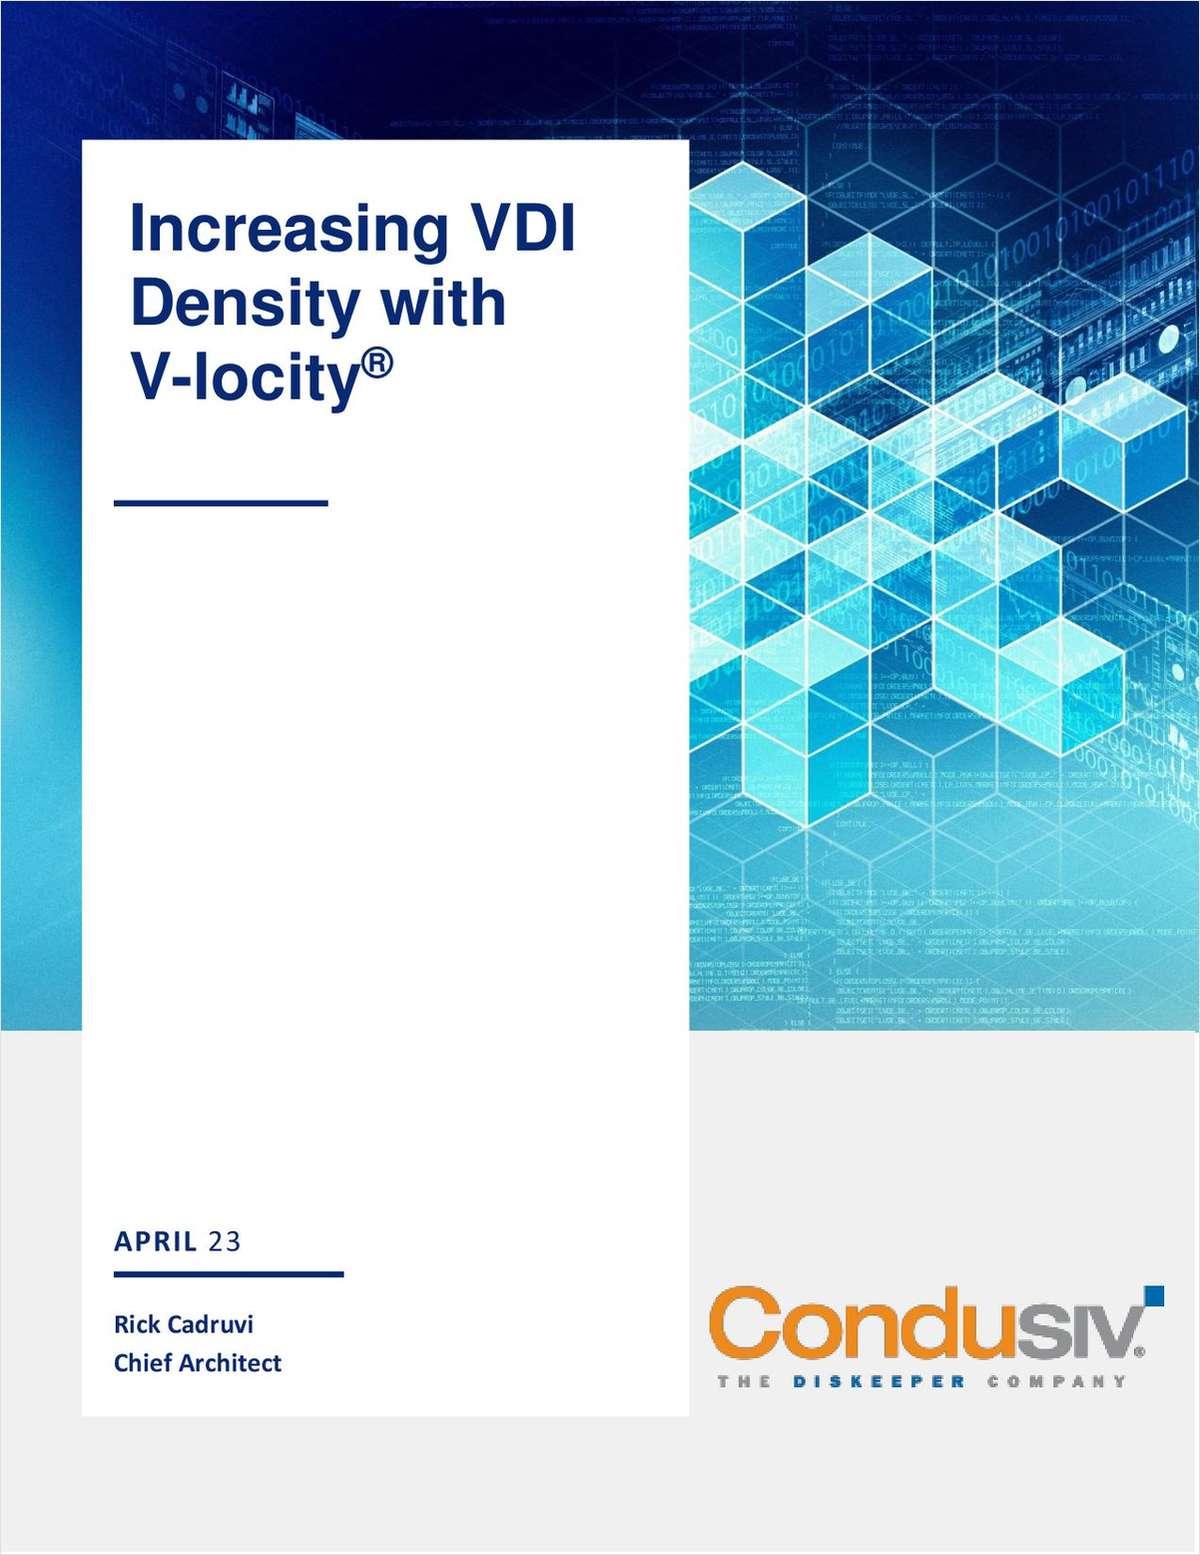 Increasing VDI Density with V-locity